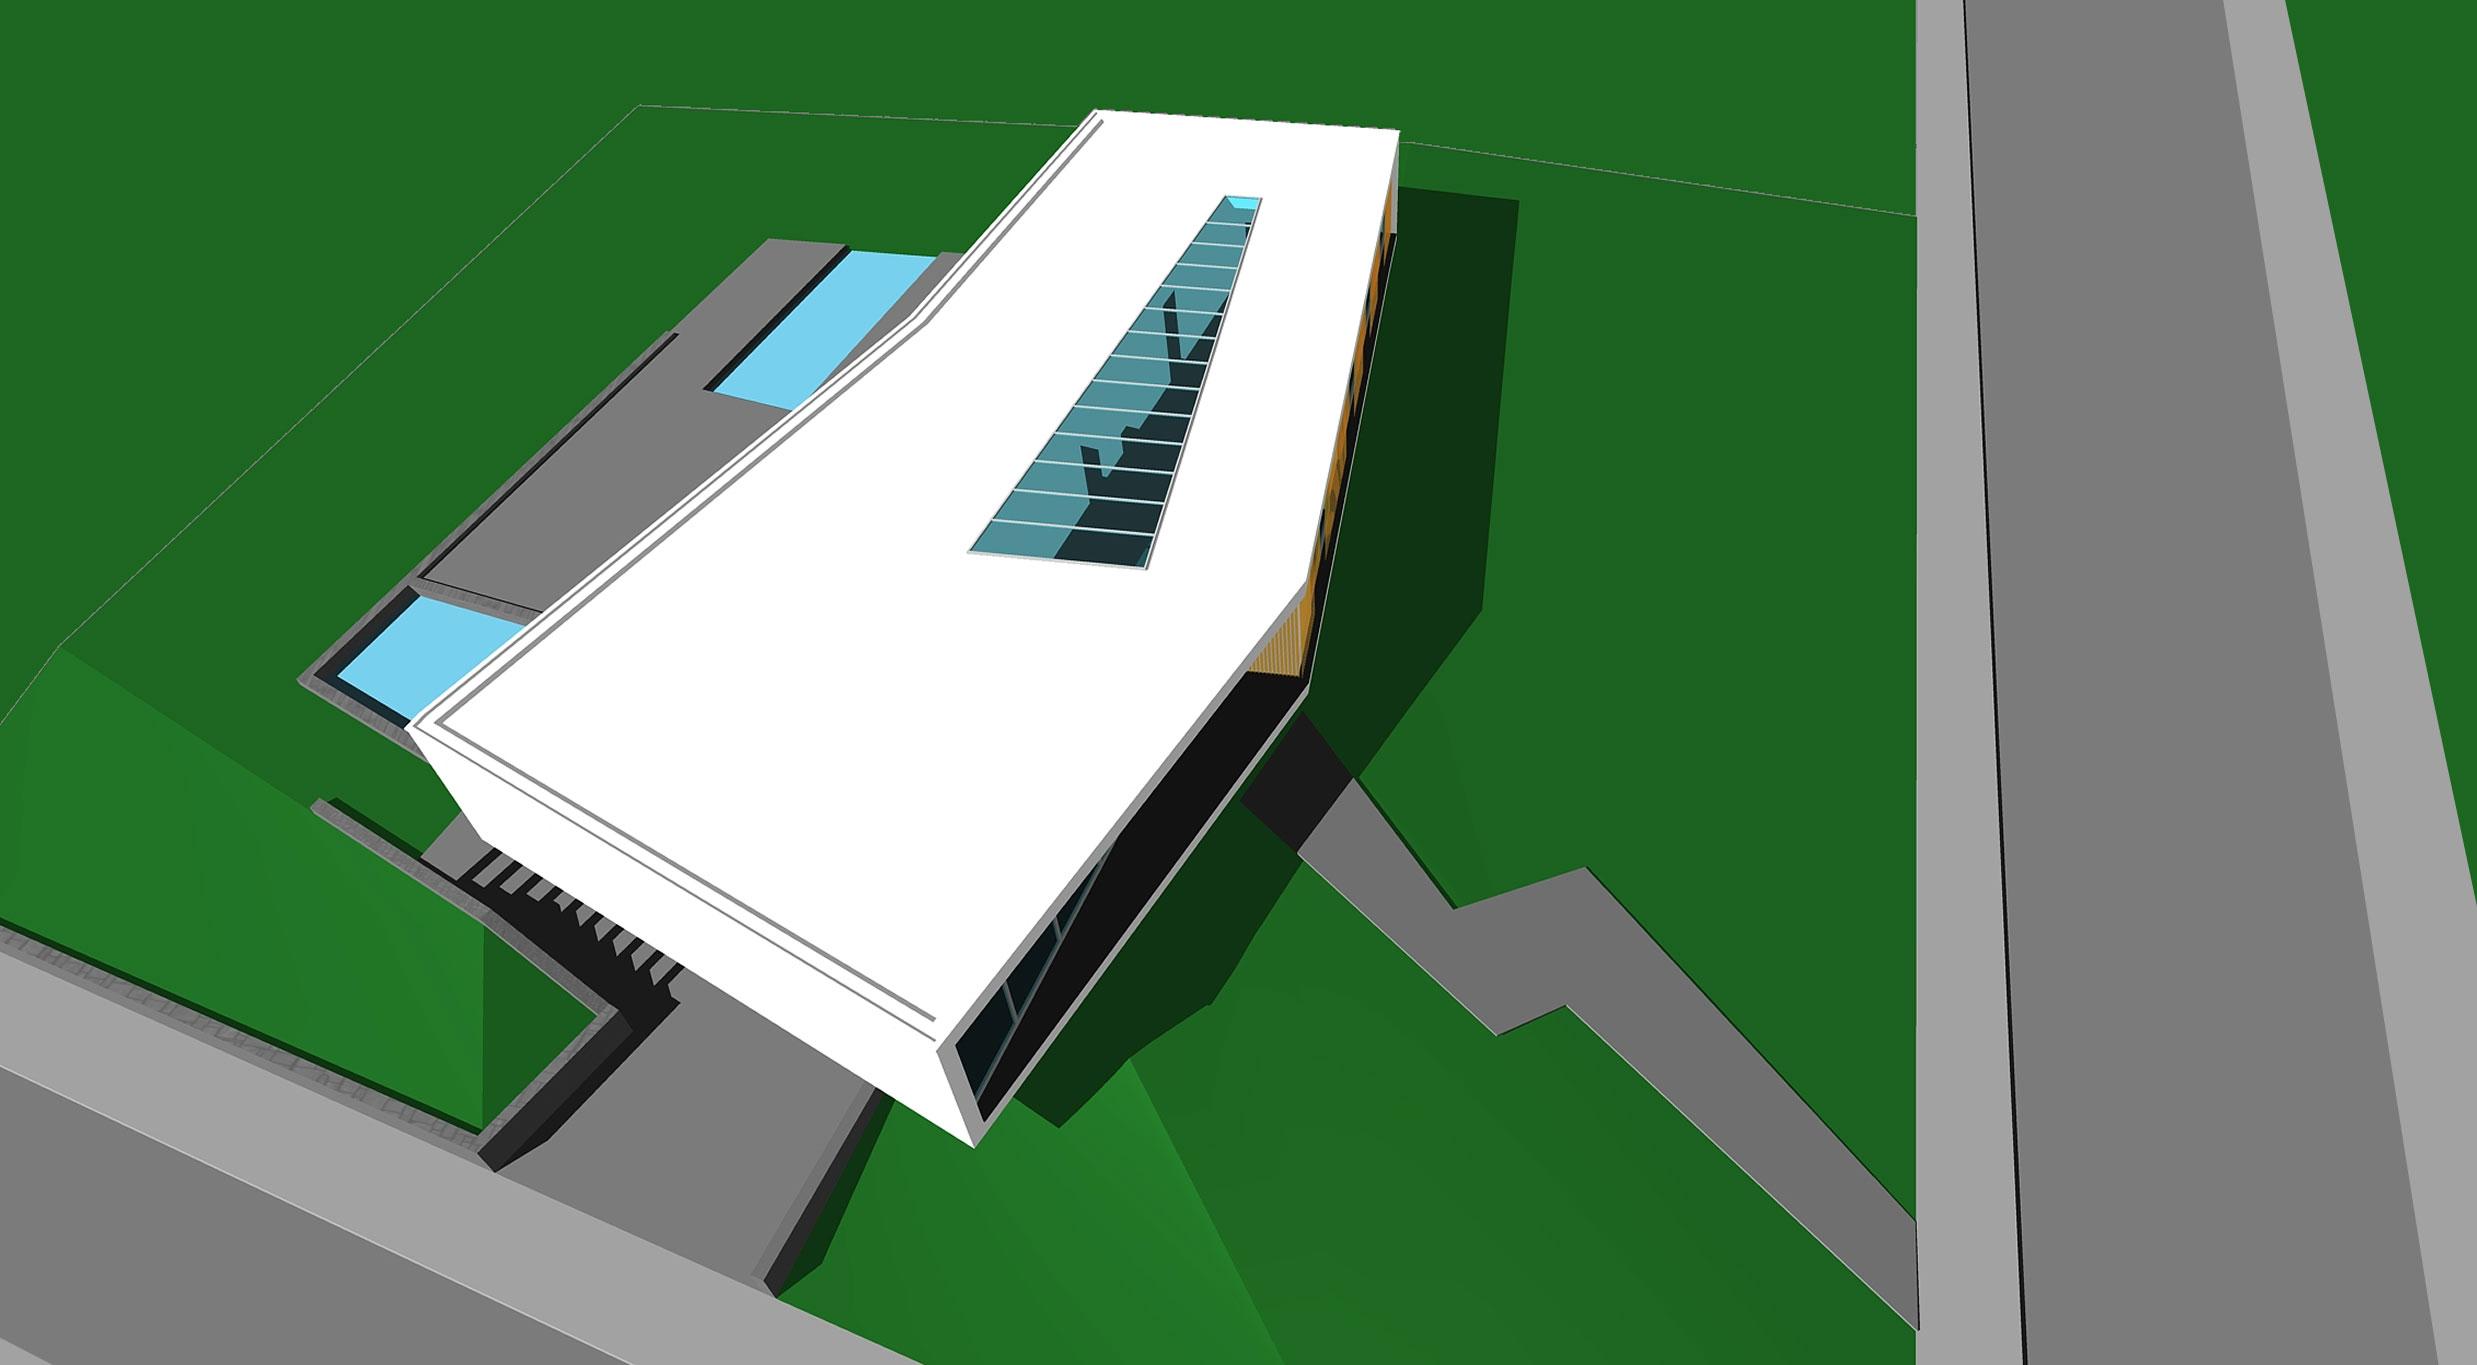 Boxed Villa Spee Haelen with Panoramic Windows by Lab32 architecten-34